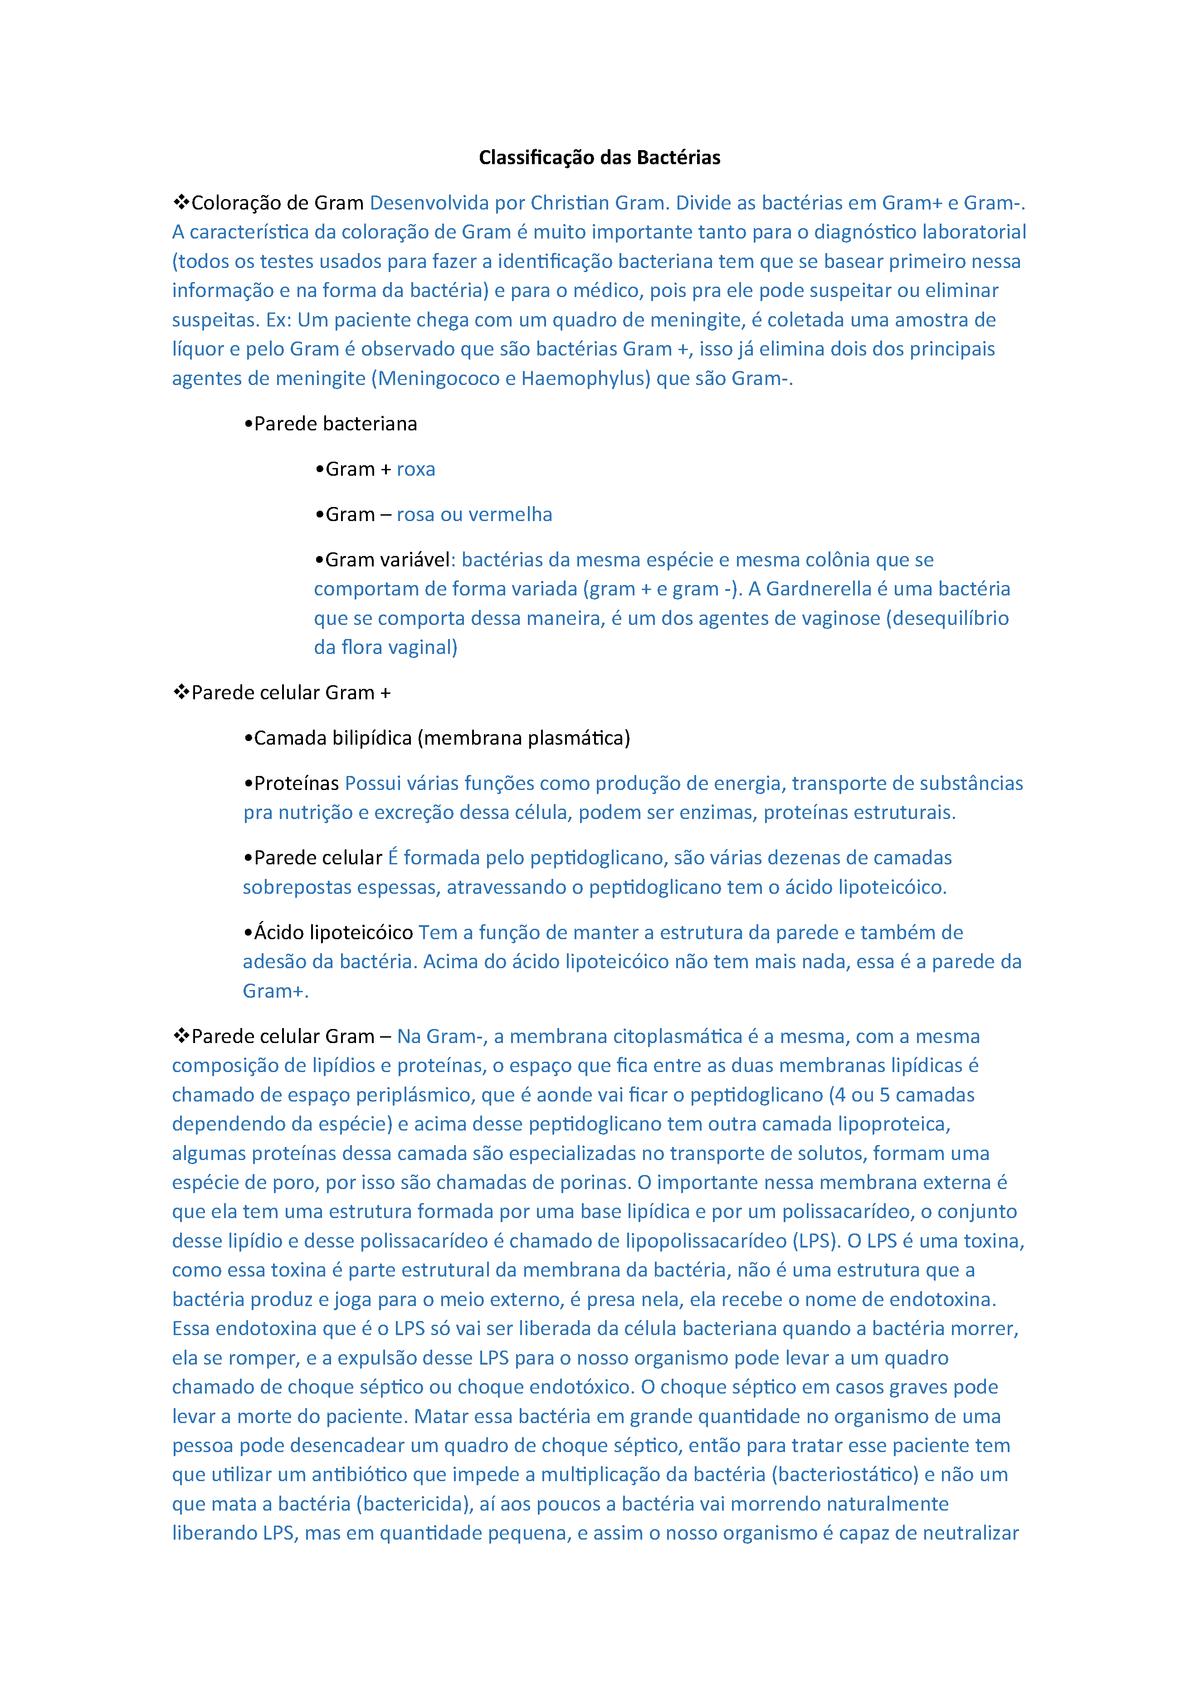 Bacteriologia 2 Crescimento Bacteriano Ics0019 Ufg